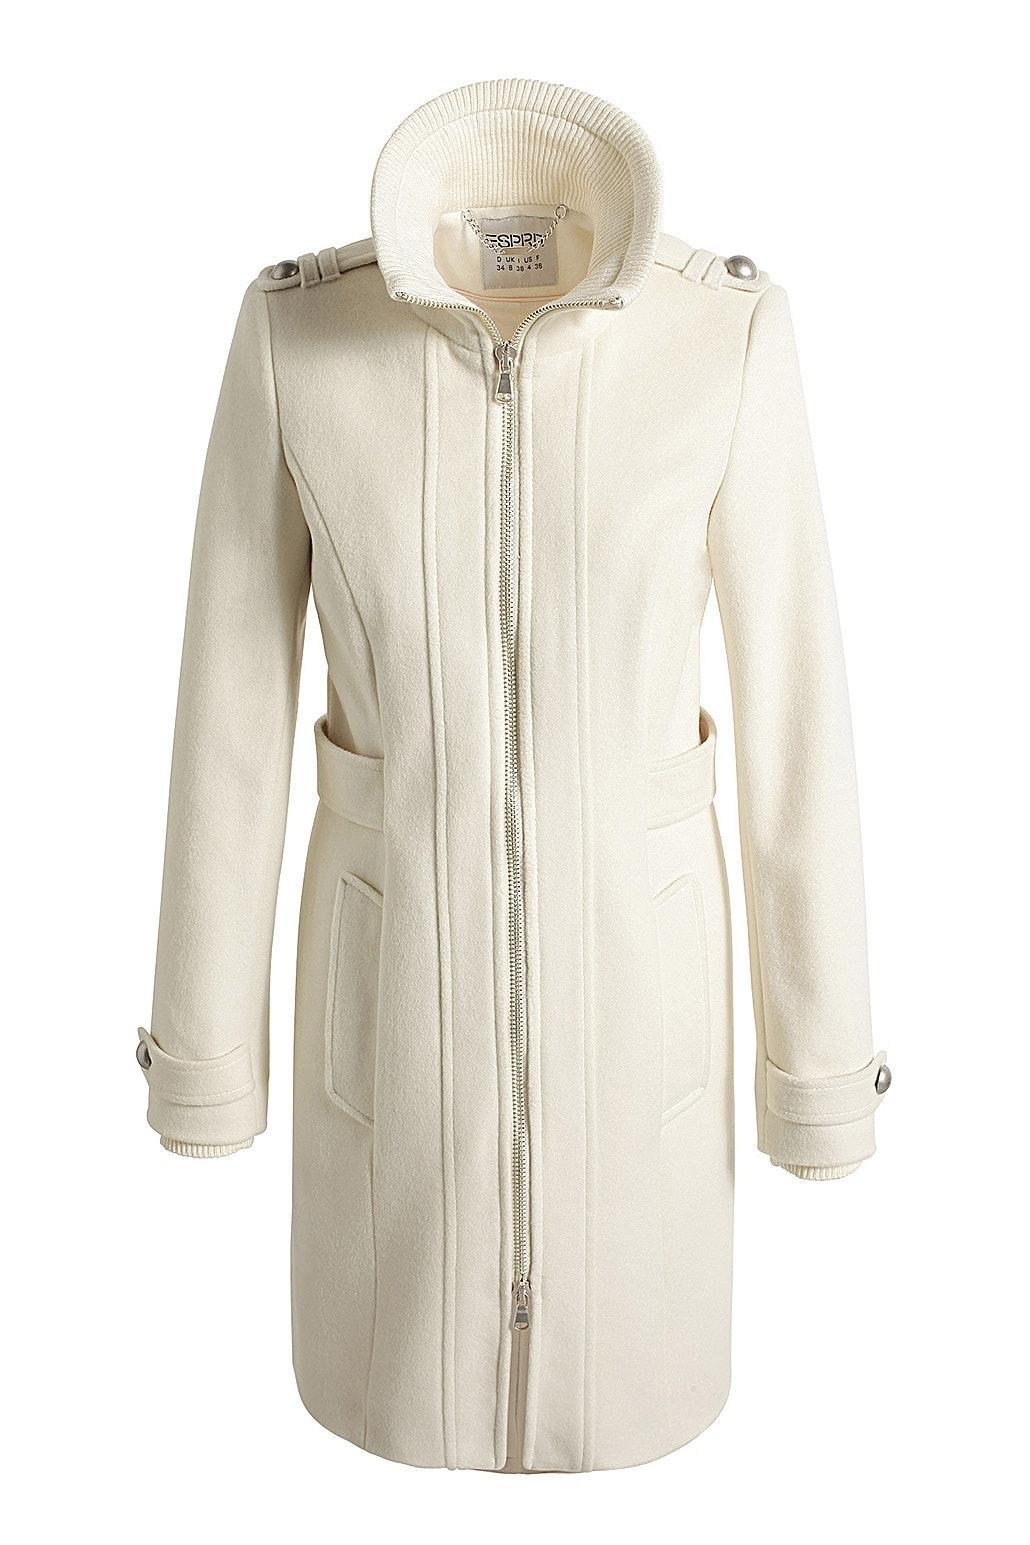 hvid uldfrakke